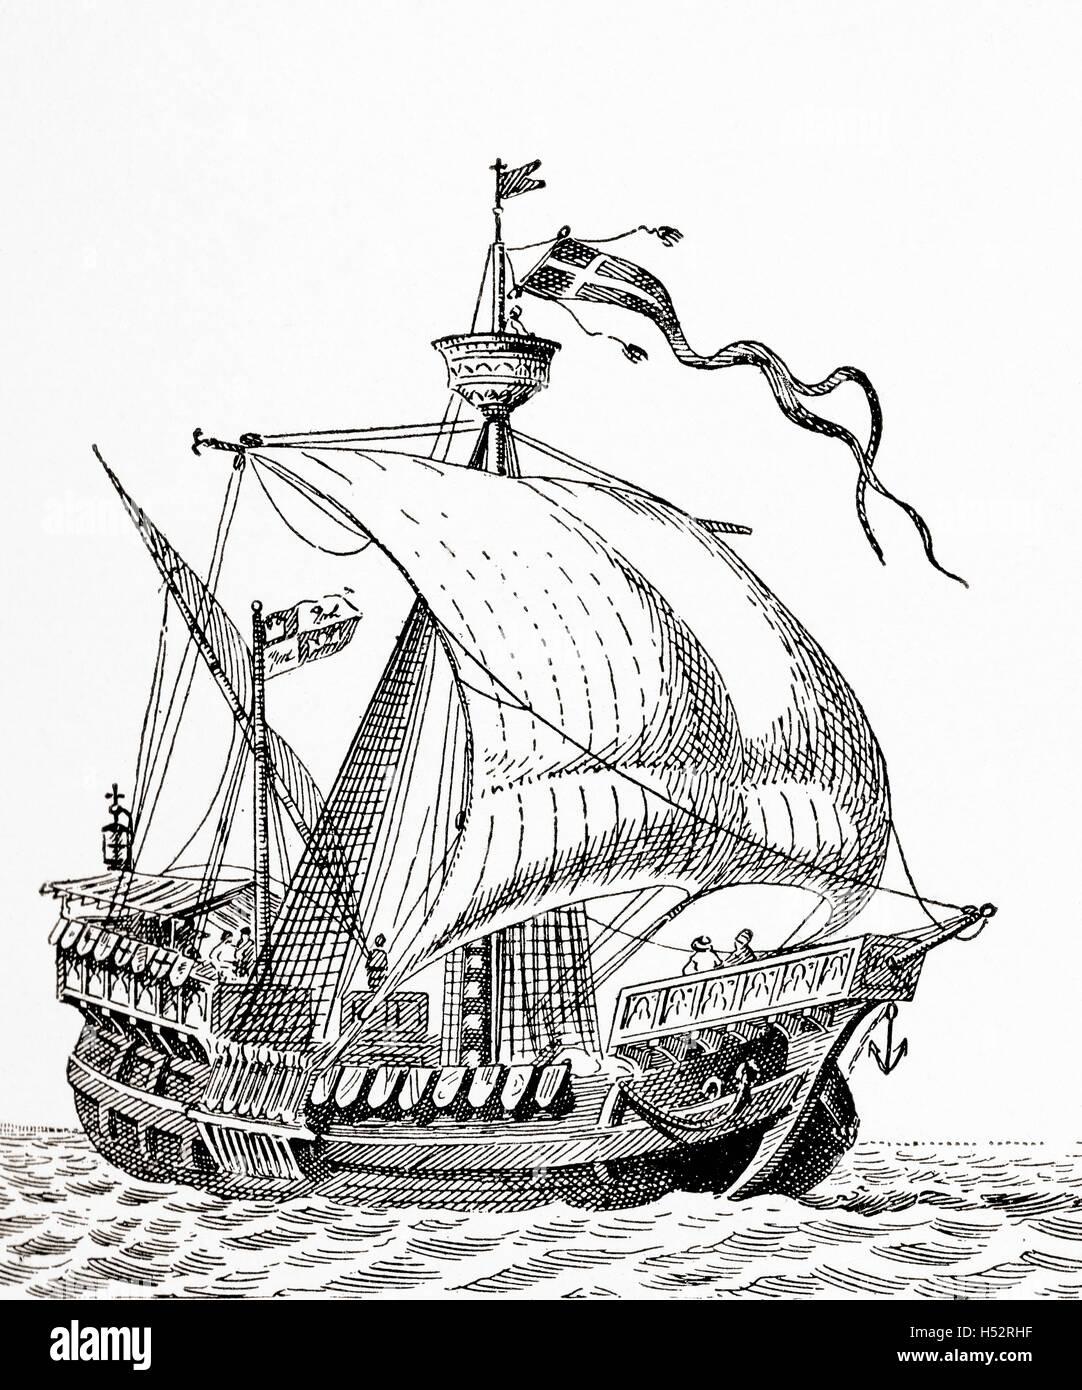 A 15th century Spanish caravel. - Stock Image